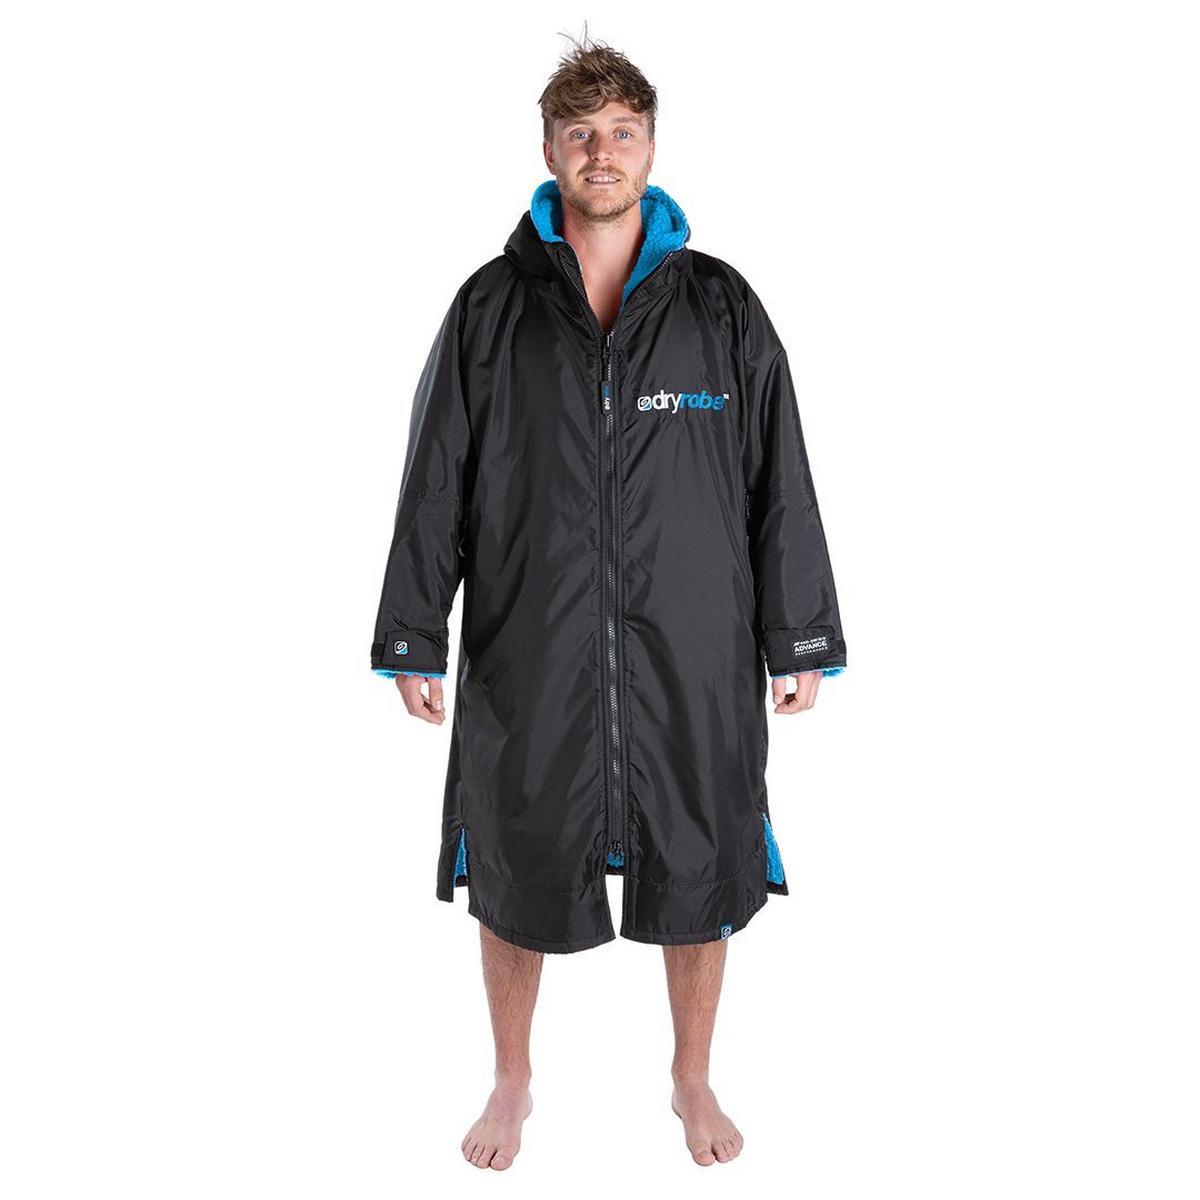 Dry Robe Advance Long Sleeve - Black/Blue